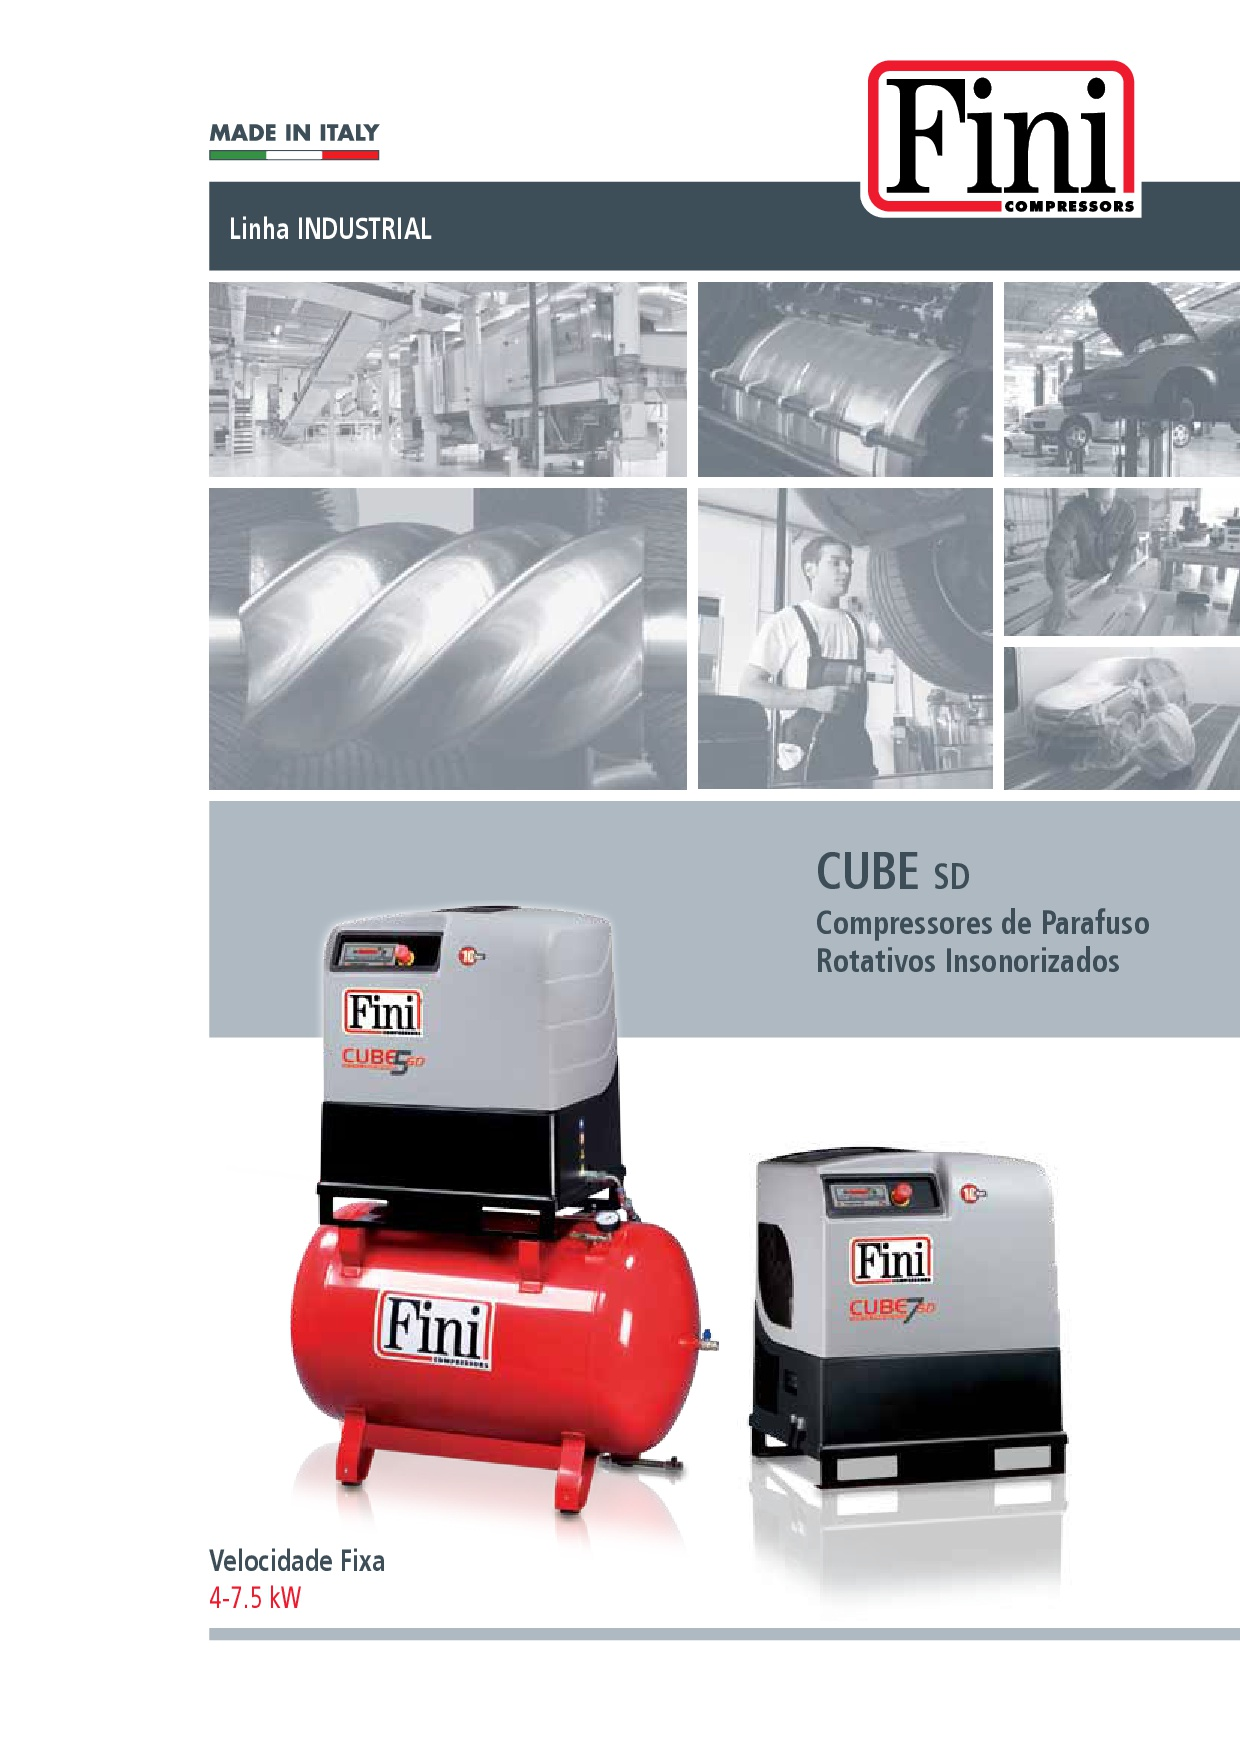 FINI CUBE – Compres. de parafuso